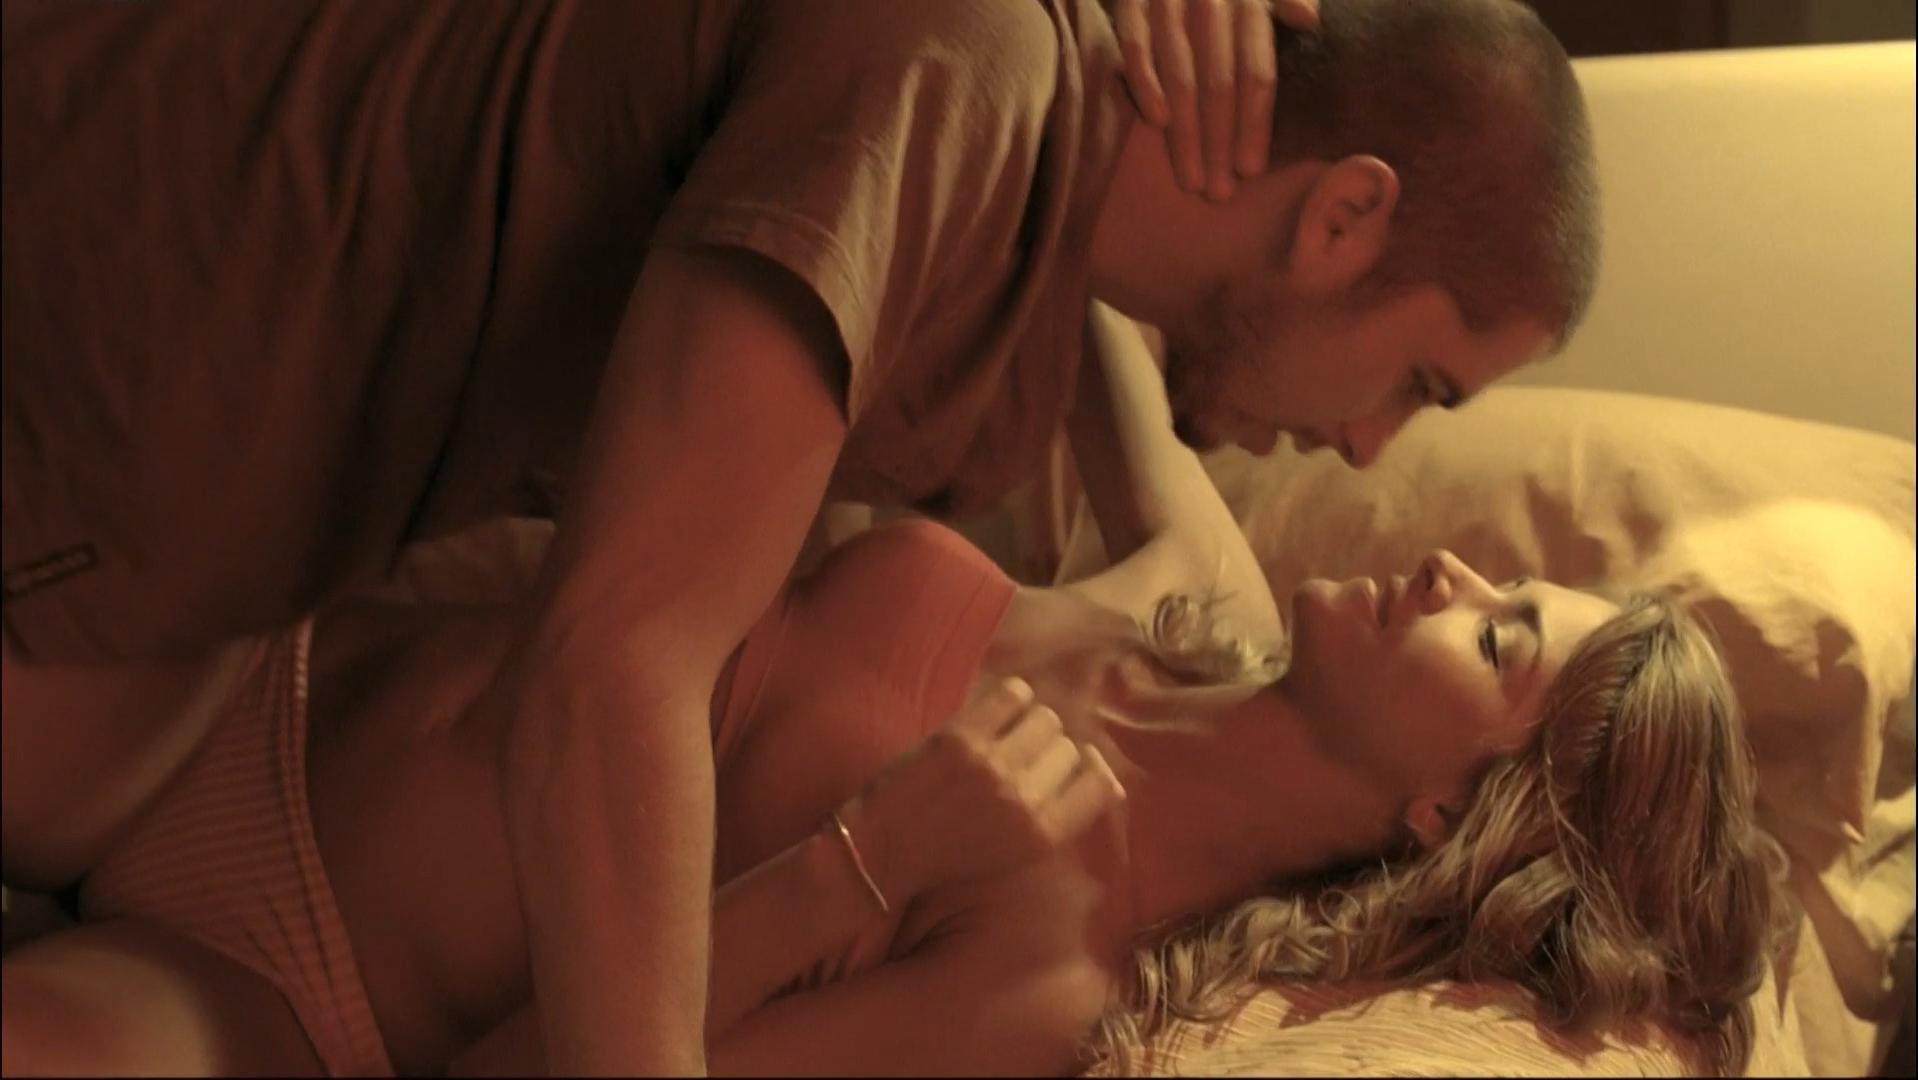 Lucia Ojeda nude, Anahi de Cardenas nude - Mancora (2008)